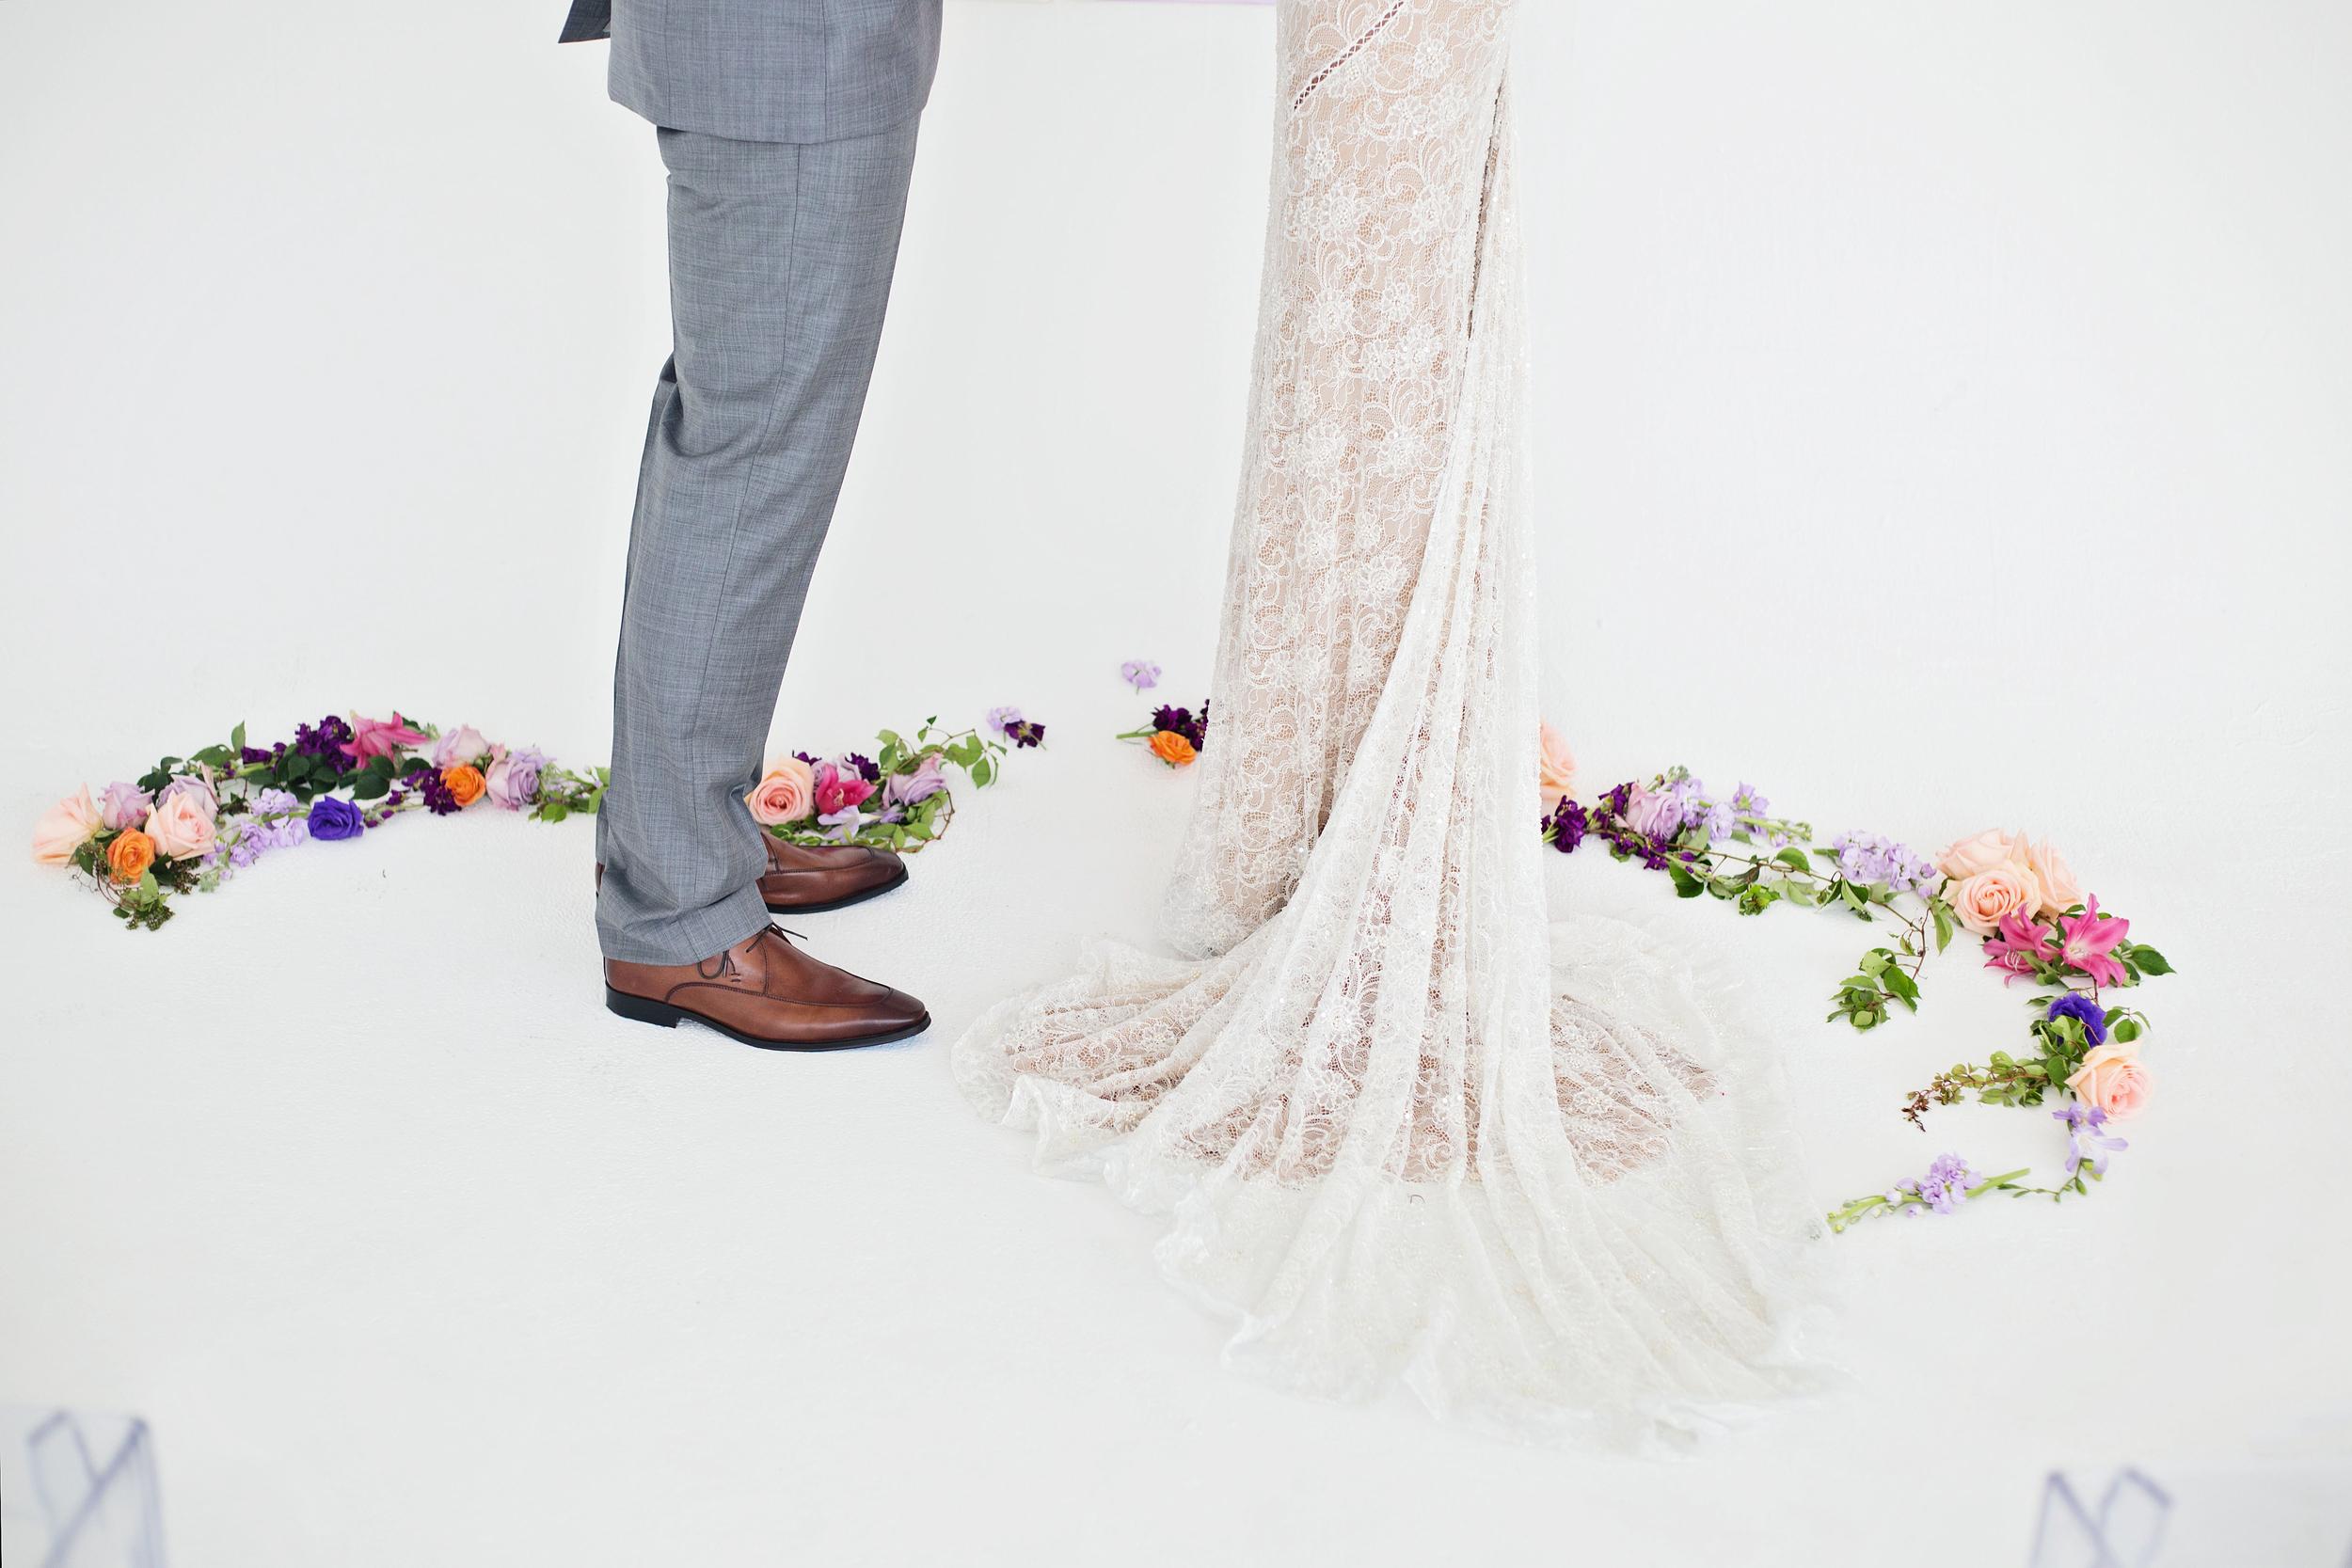 Flowers at feet.jpg